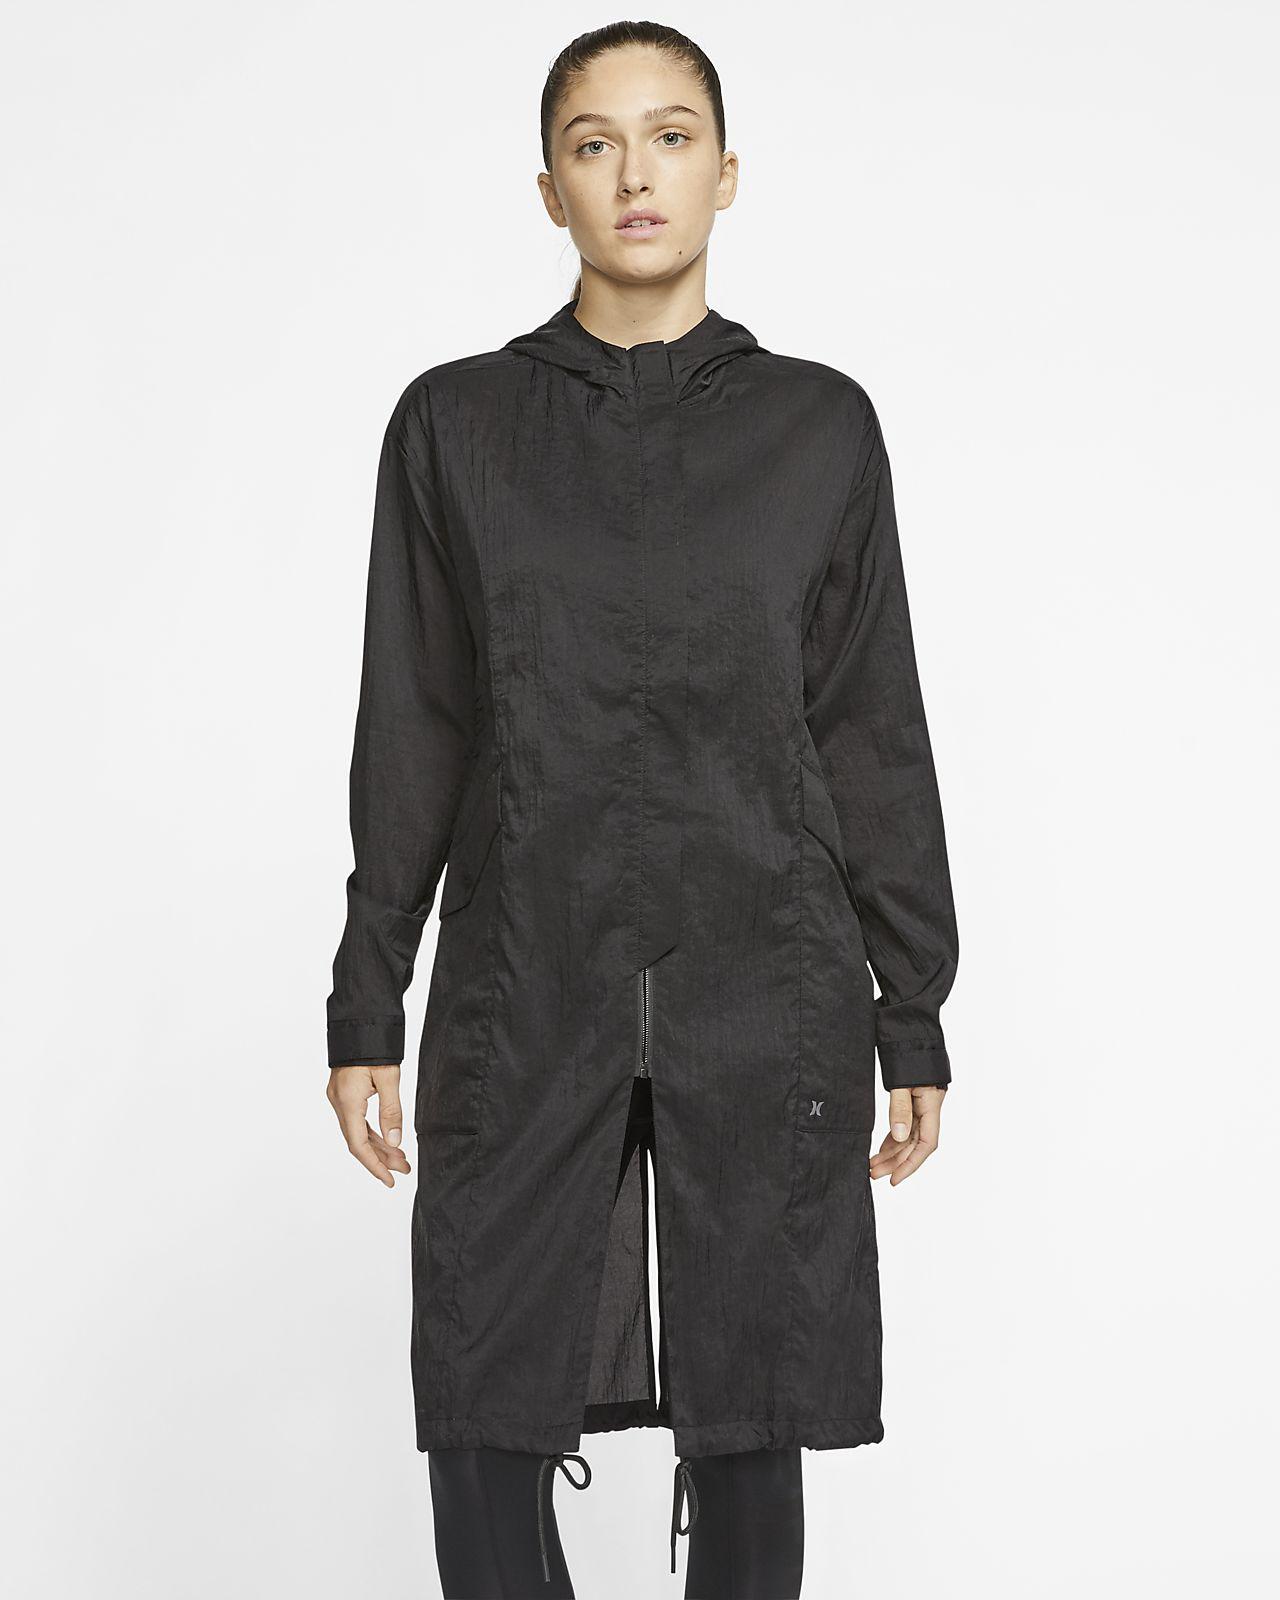 Nike Sportswear Trench Giacca Donna Nero Abbigliamento